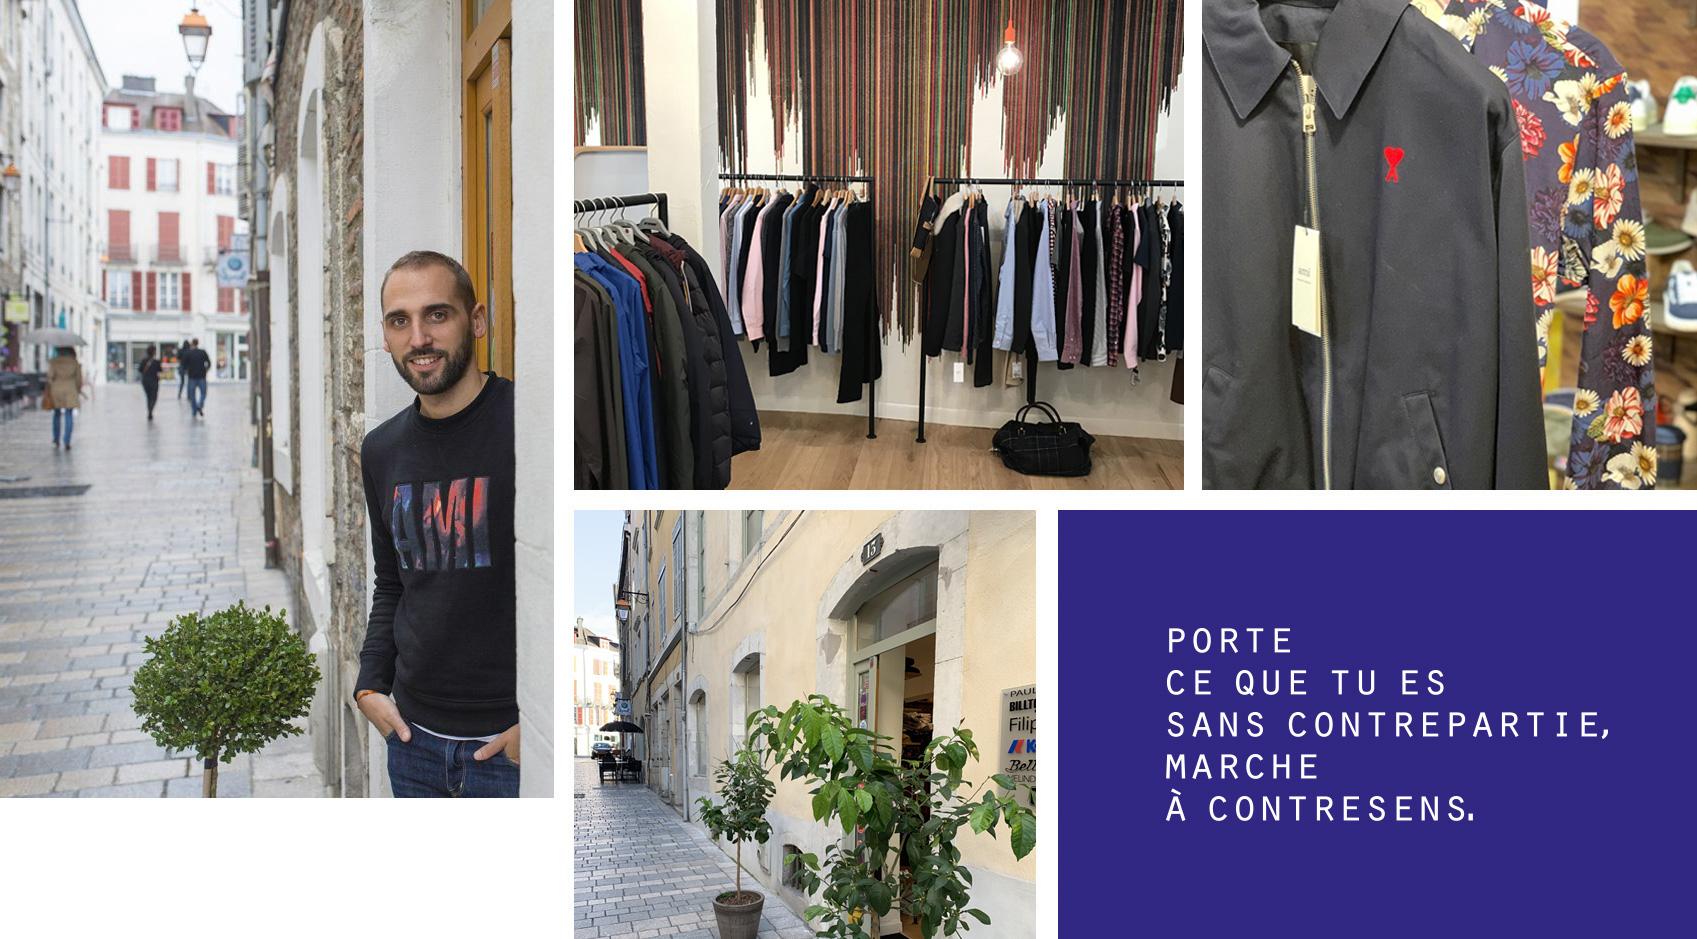 contresens_boutique_pau_hello2021